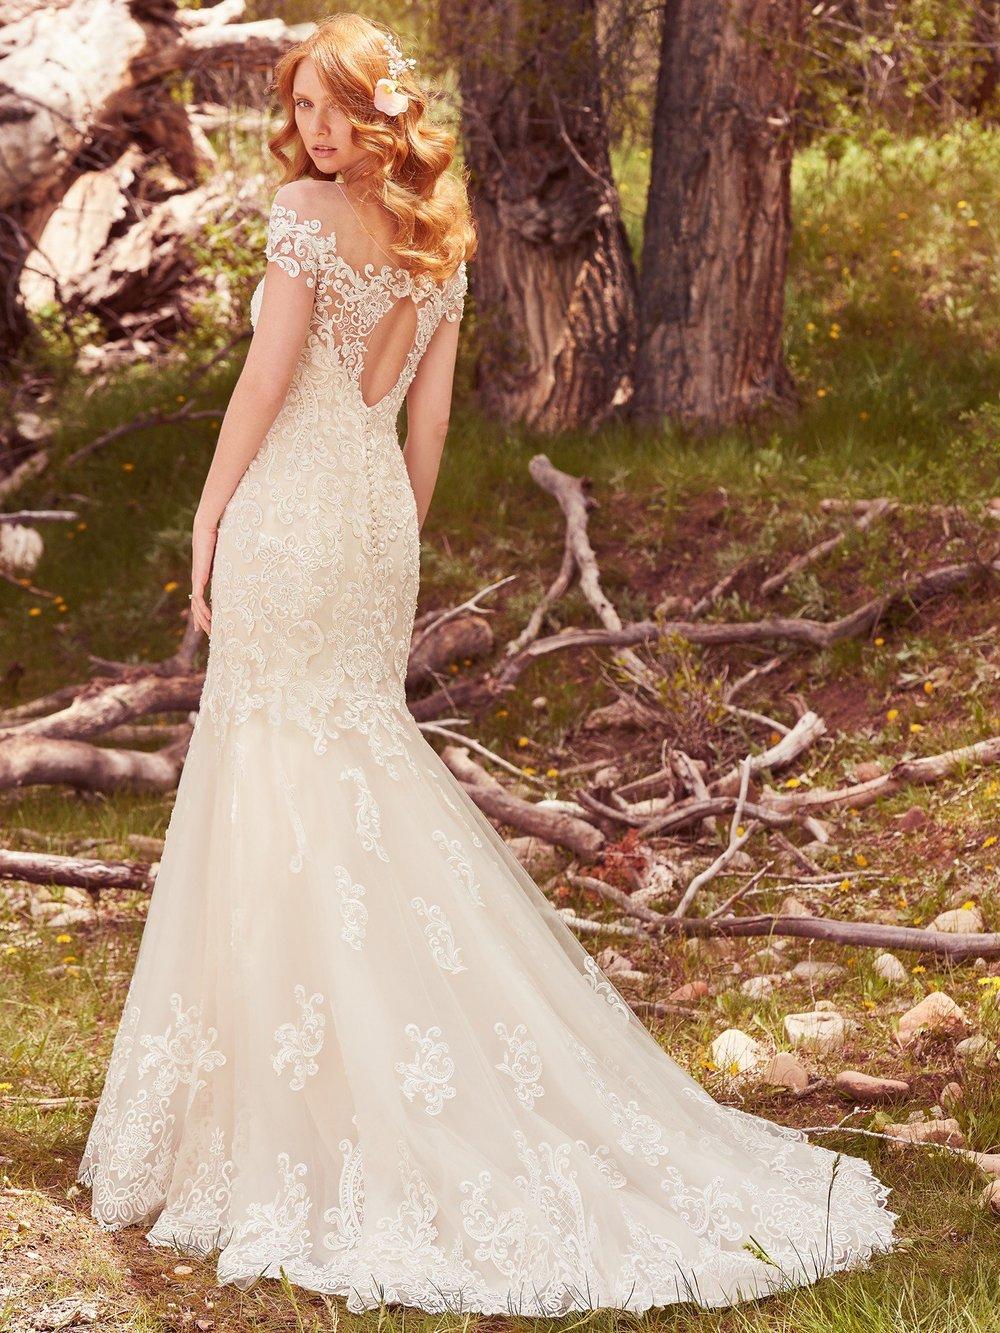 Maggie-Sottero-Wedding-Dress-Marcy-7MT379-MainBack (1).jpg